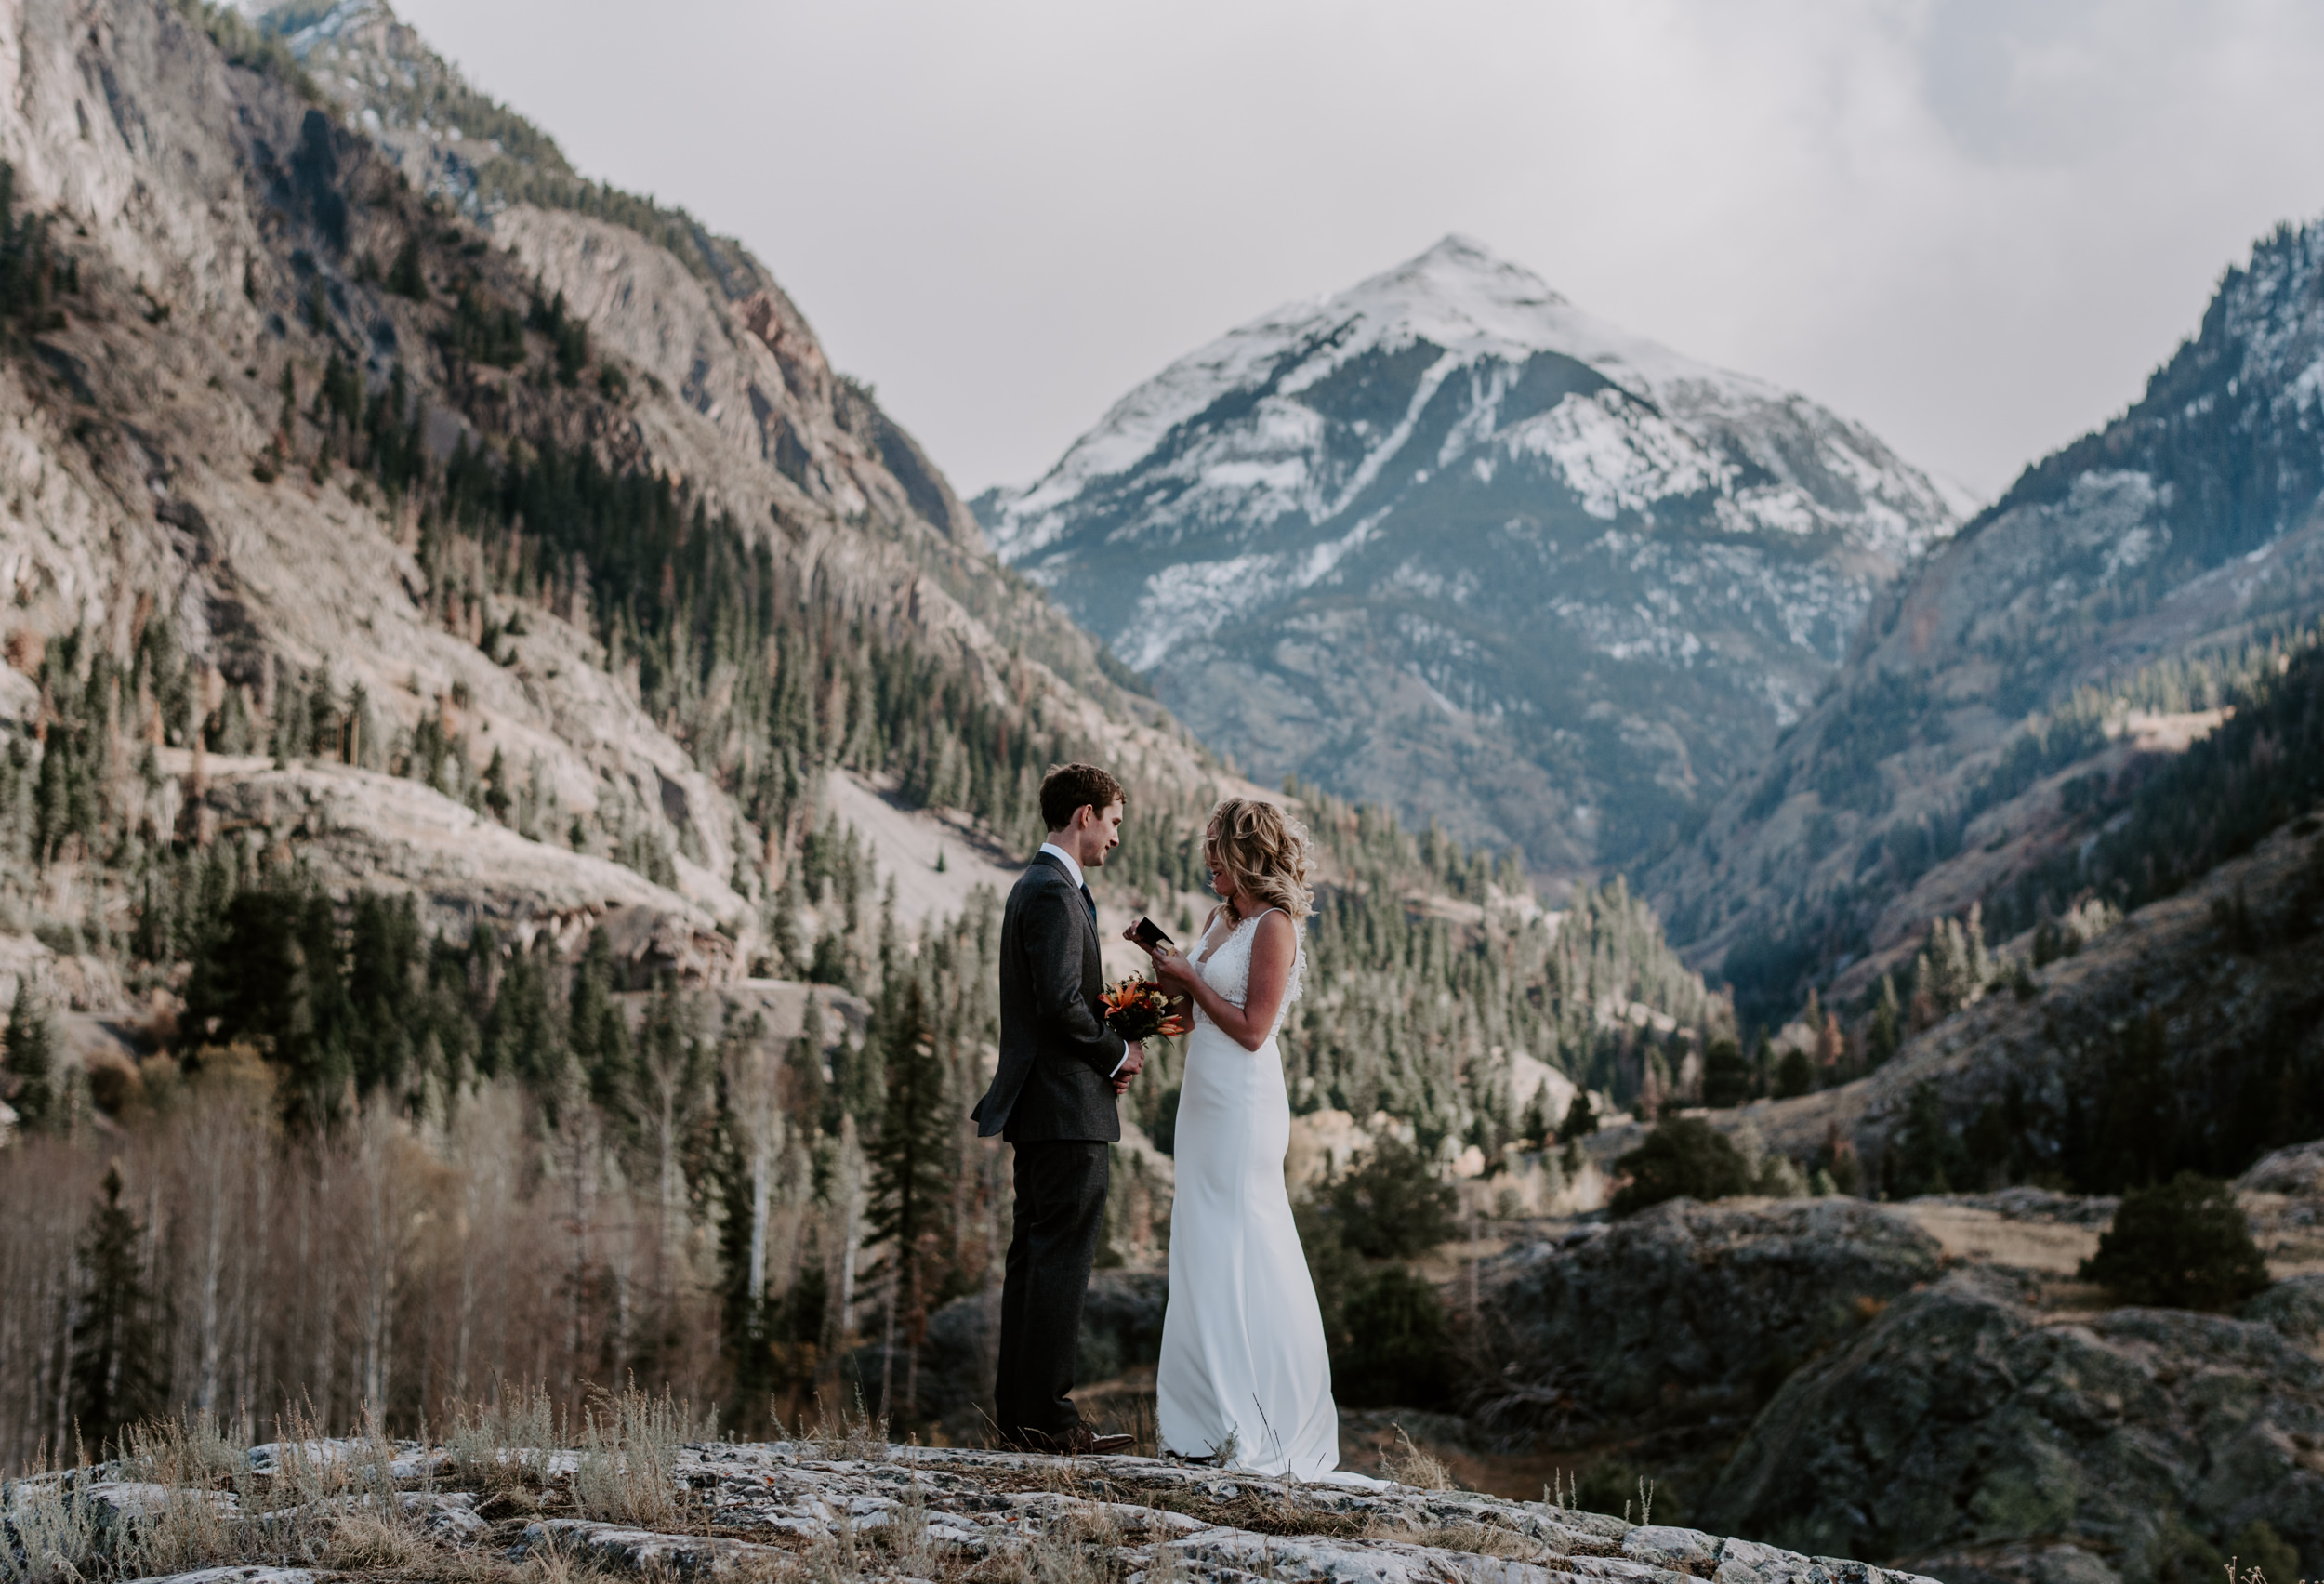 Elopement ceremony in Ouray, Colorado. Denver wedding and elopement photographer. Adventure mountain wedding